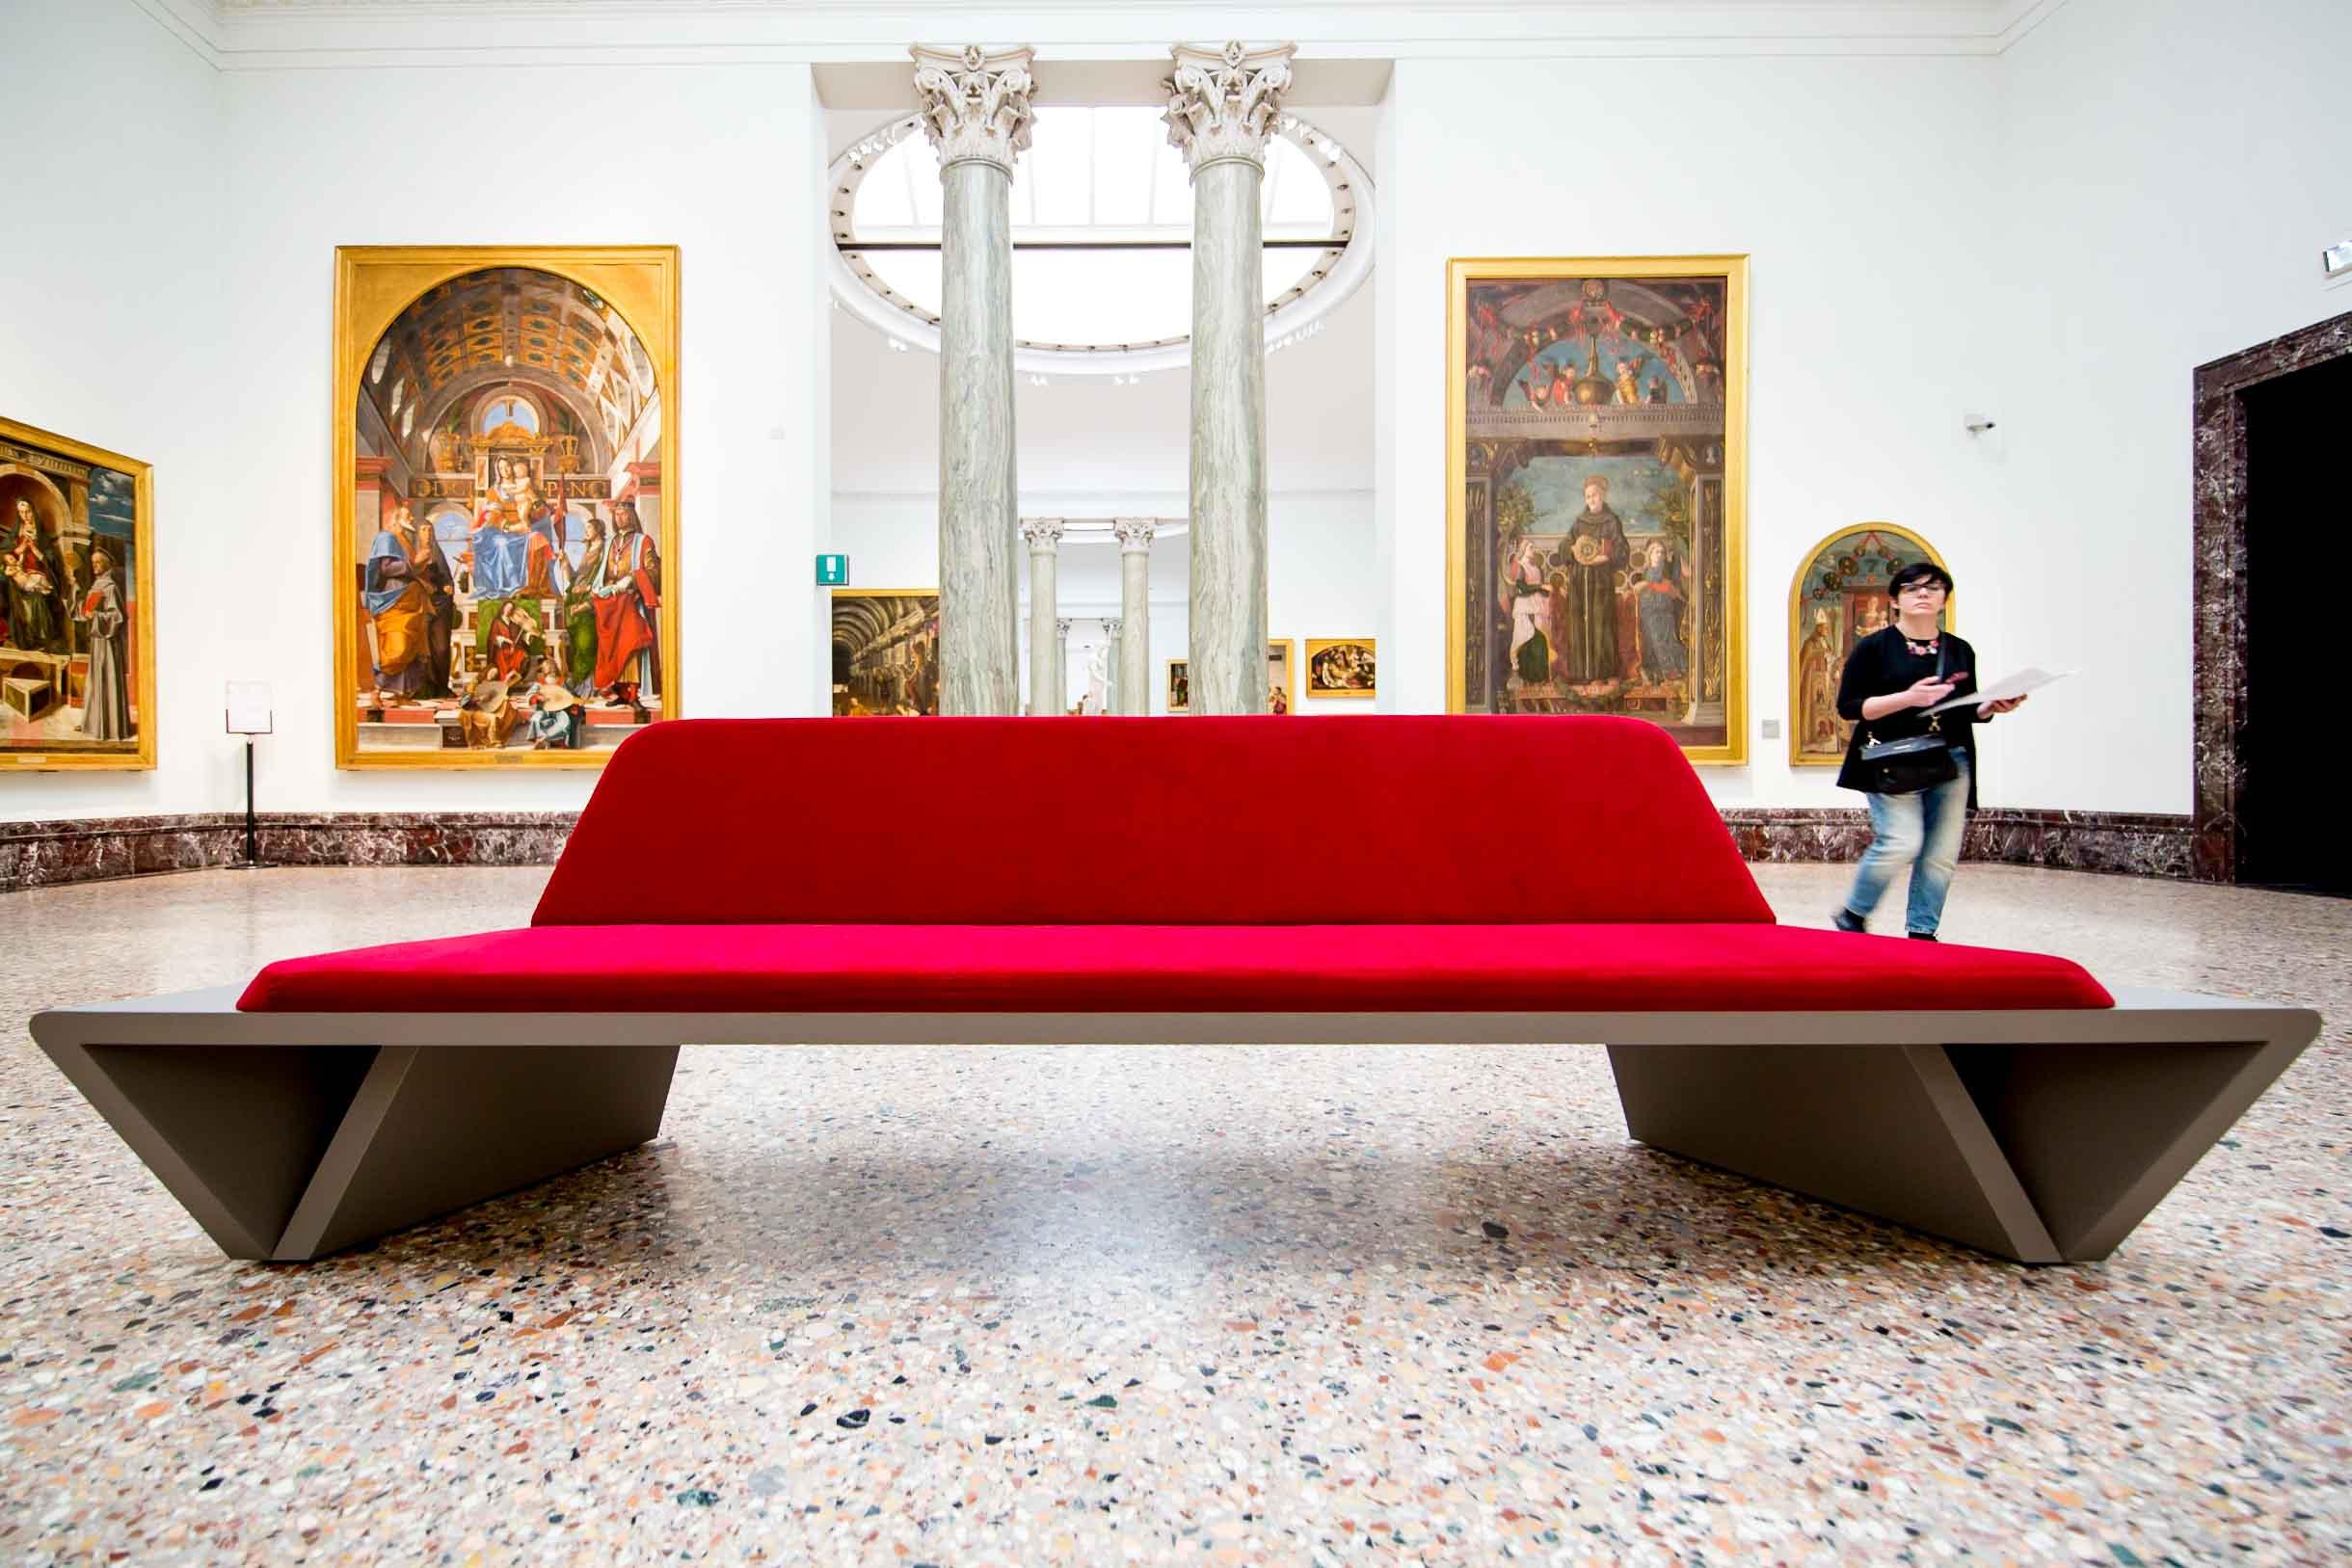 Arredo spazi museali Pinacoteca di Brera Milano